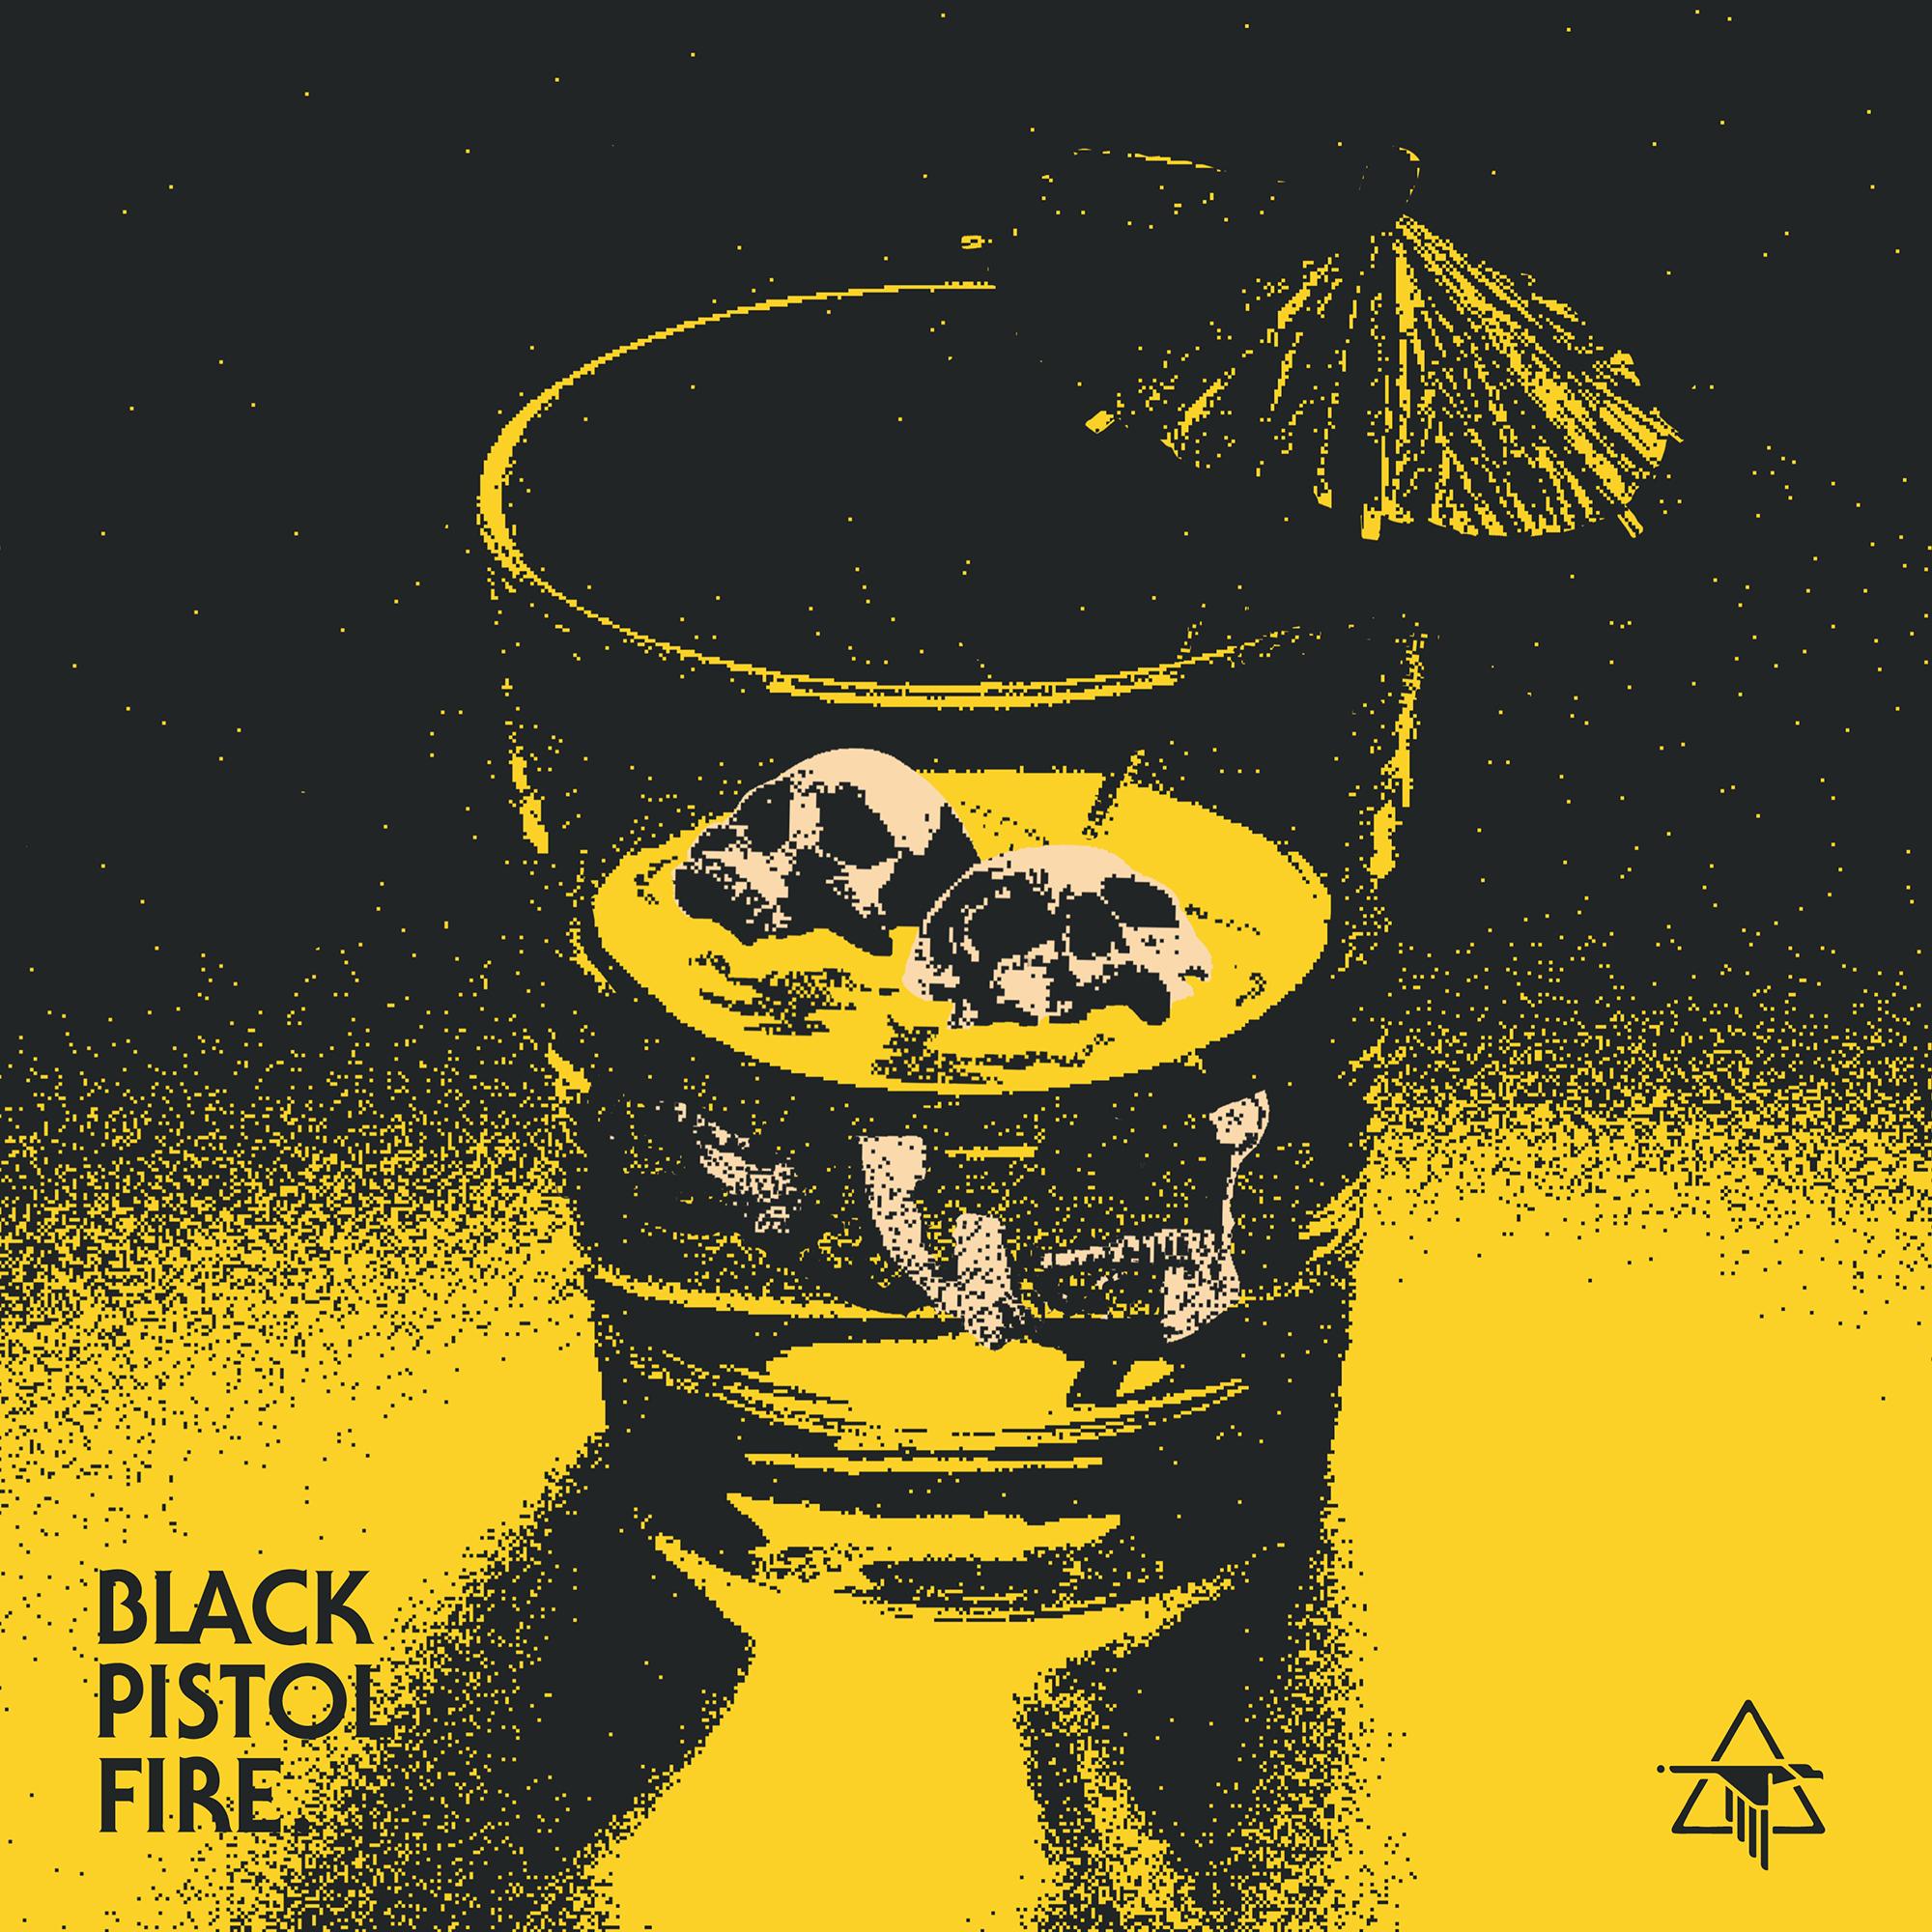 BlackPistolFire_Singles_PickYourPoison_3000px3000px_May9_2019.jpg